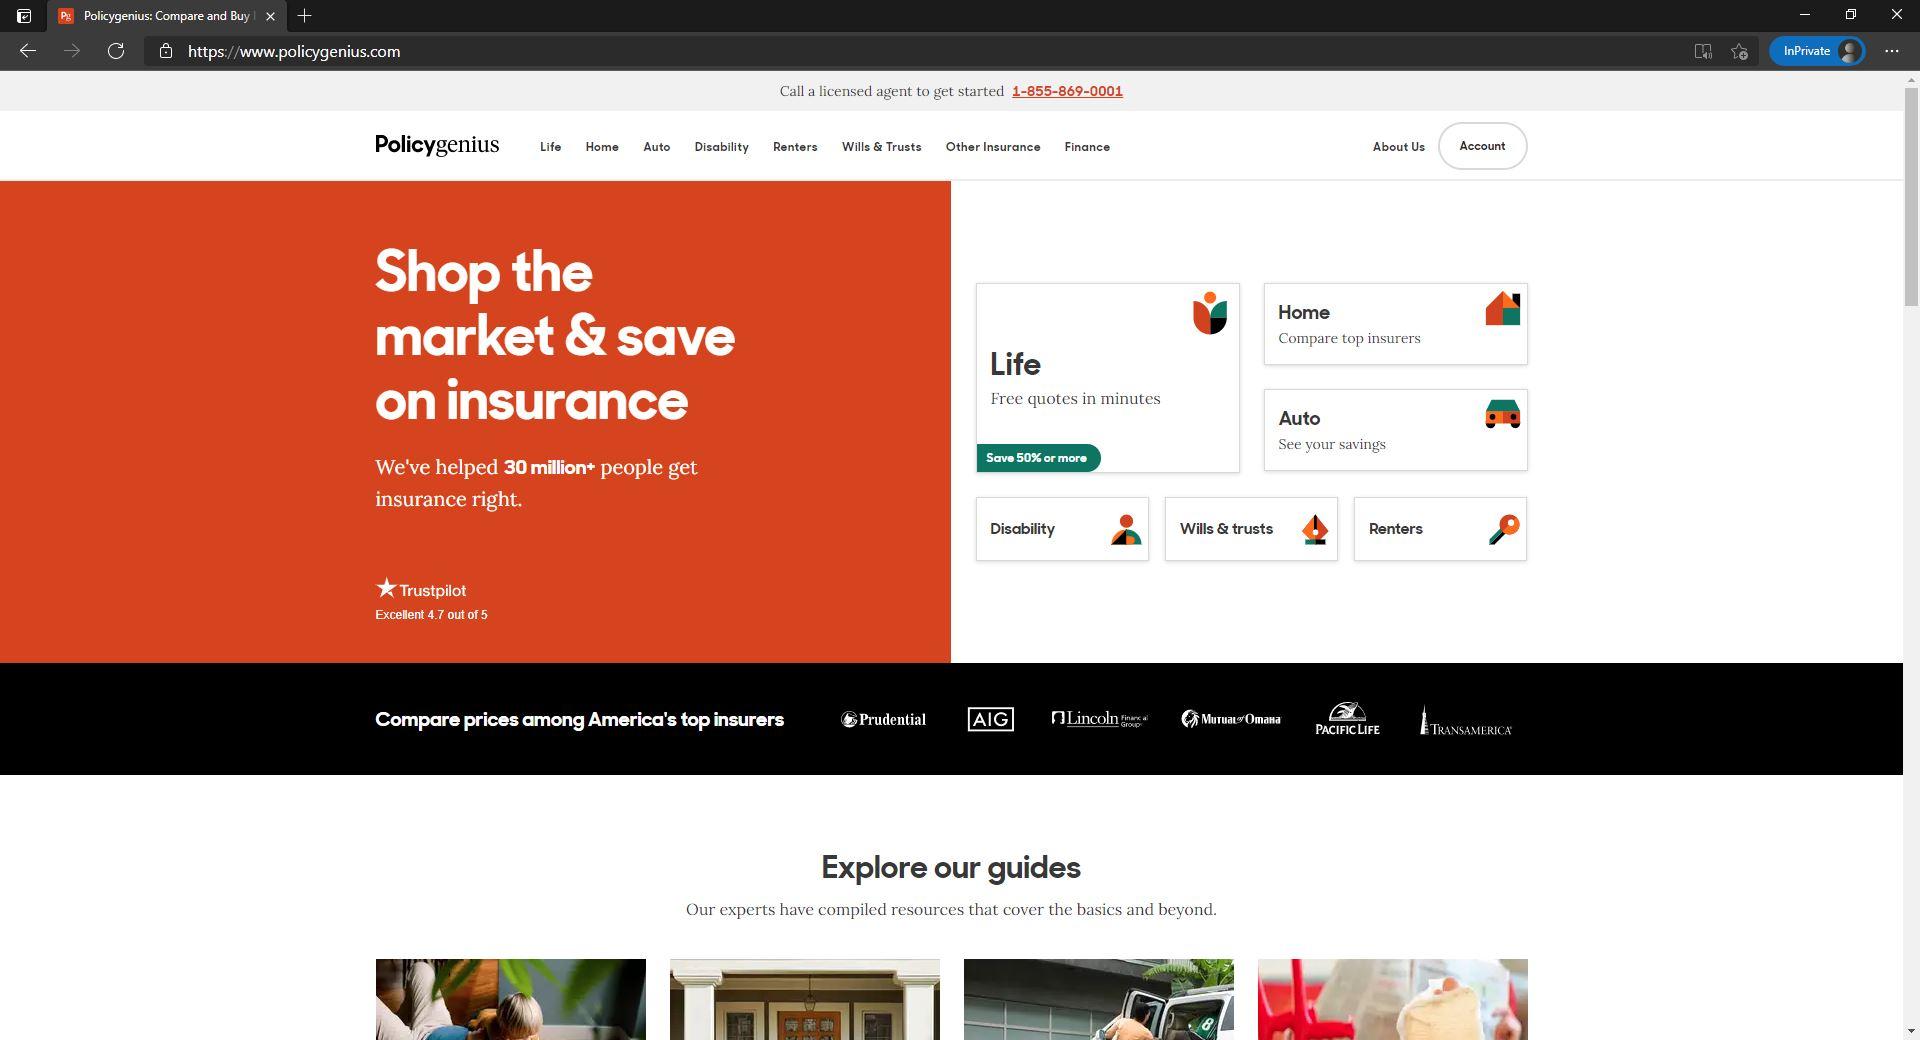 PolicyGenius website homepage